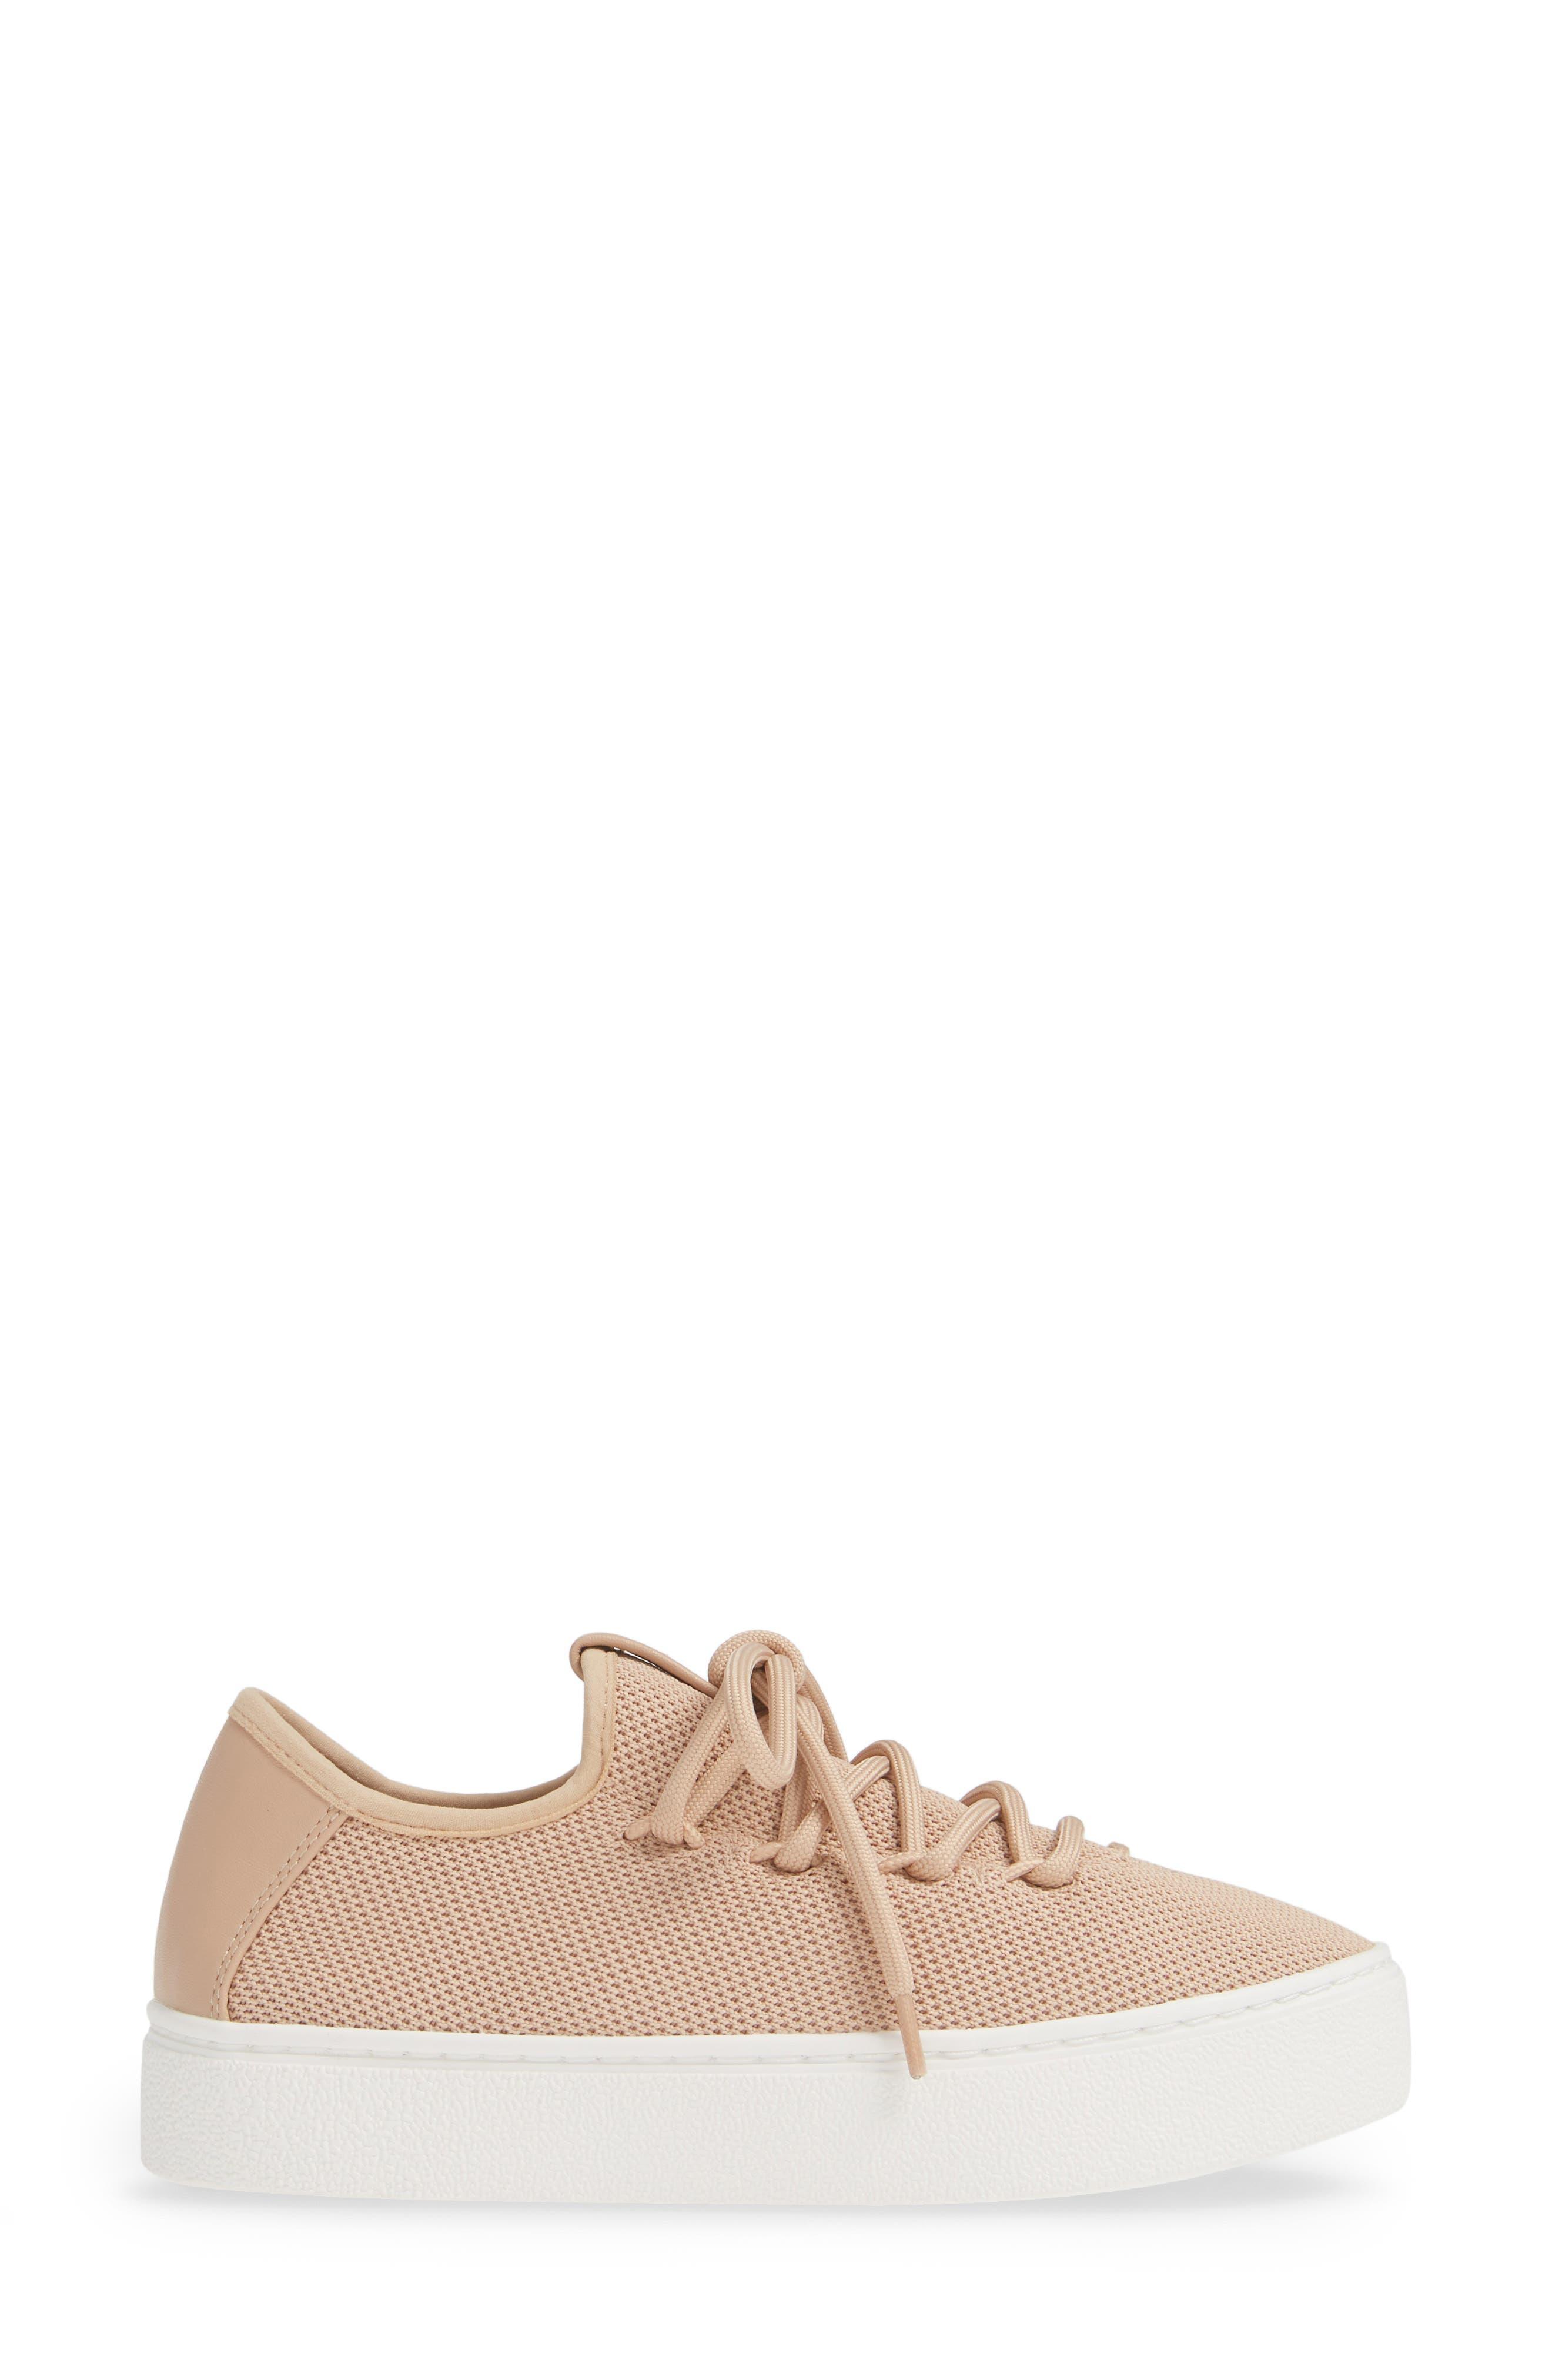 BP., BP Lace-Up Sneaker, Alternate thumbnail 3, color, BLUSH FABRIC